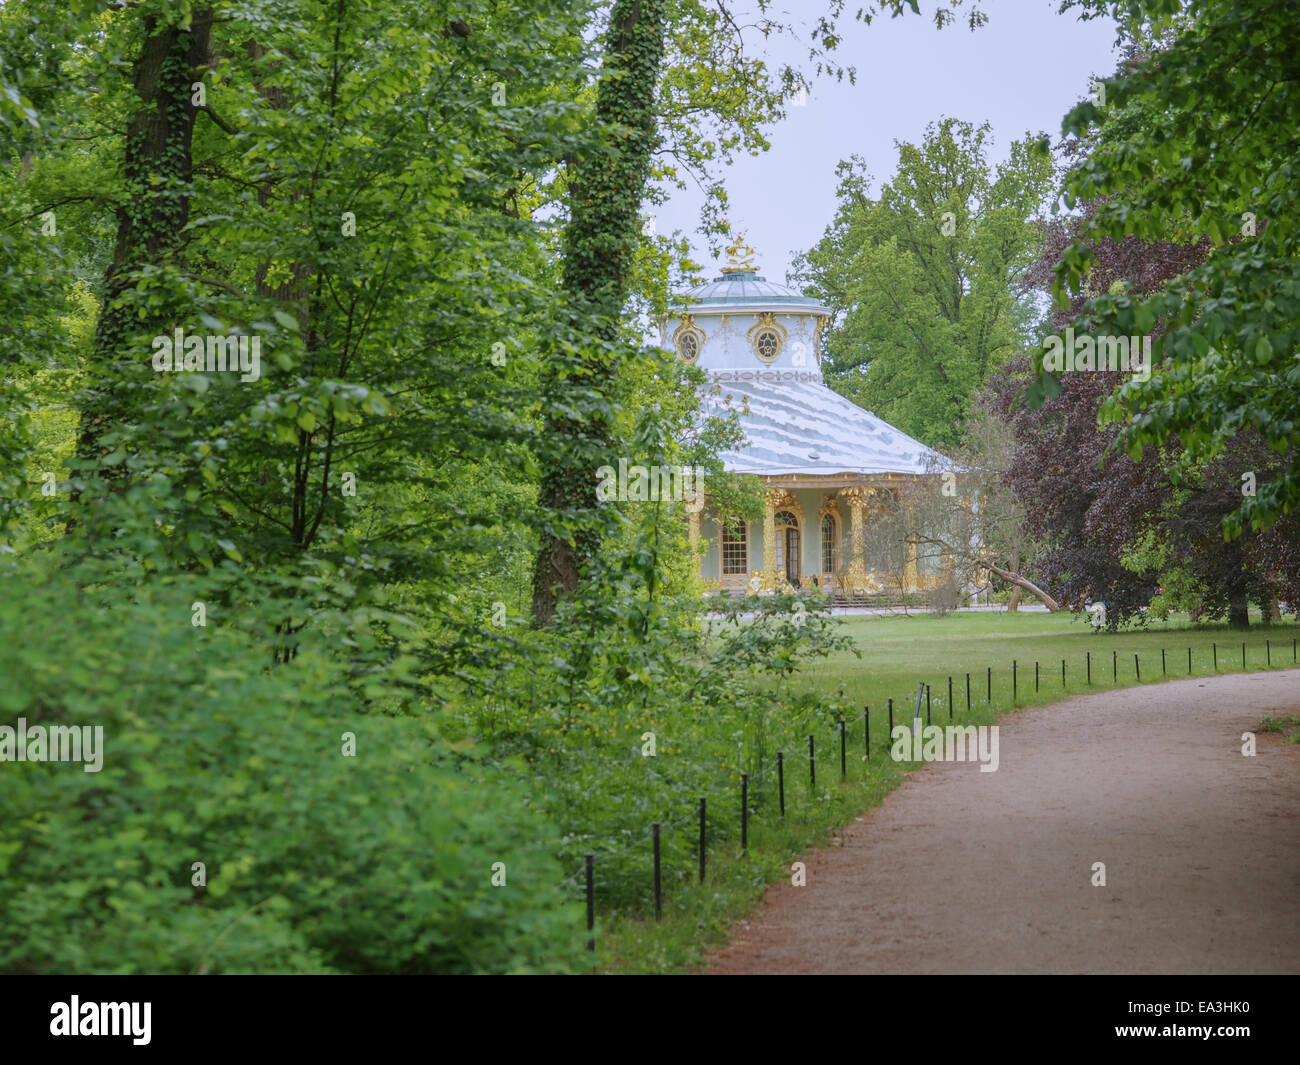 Tea house in Park Sanssouci in Potsdam - Stock Image